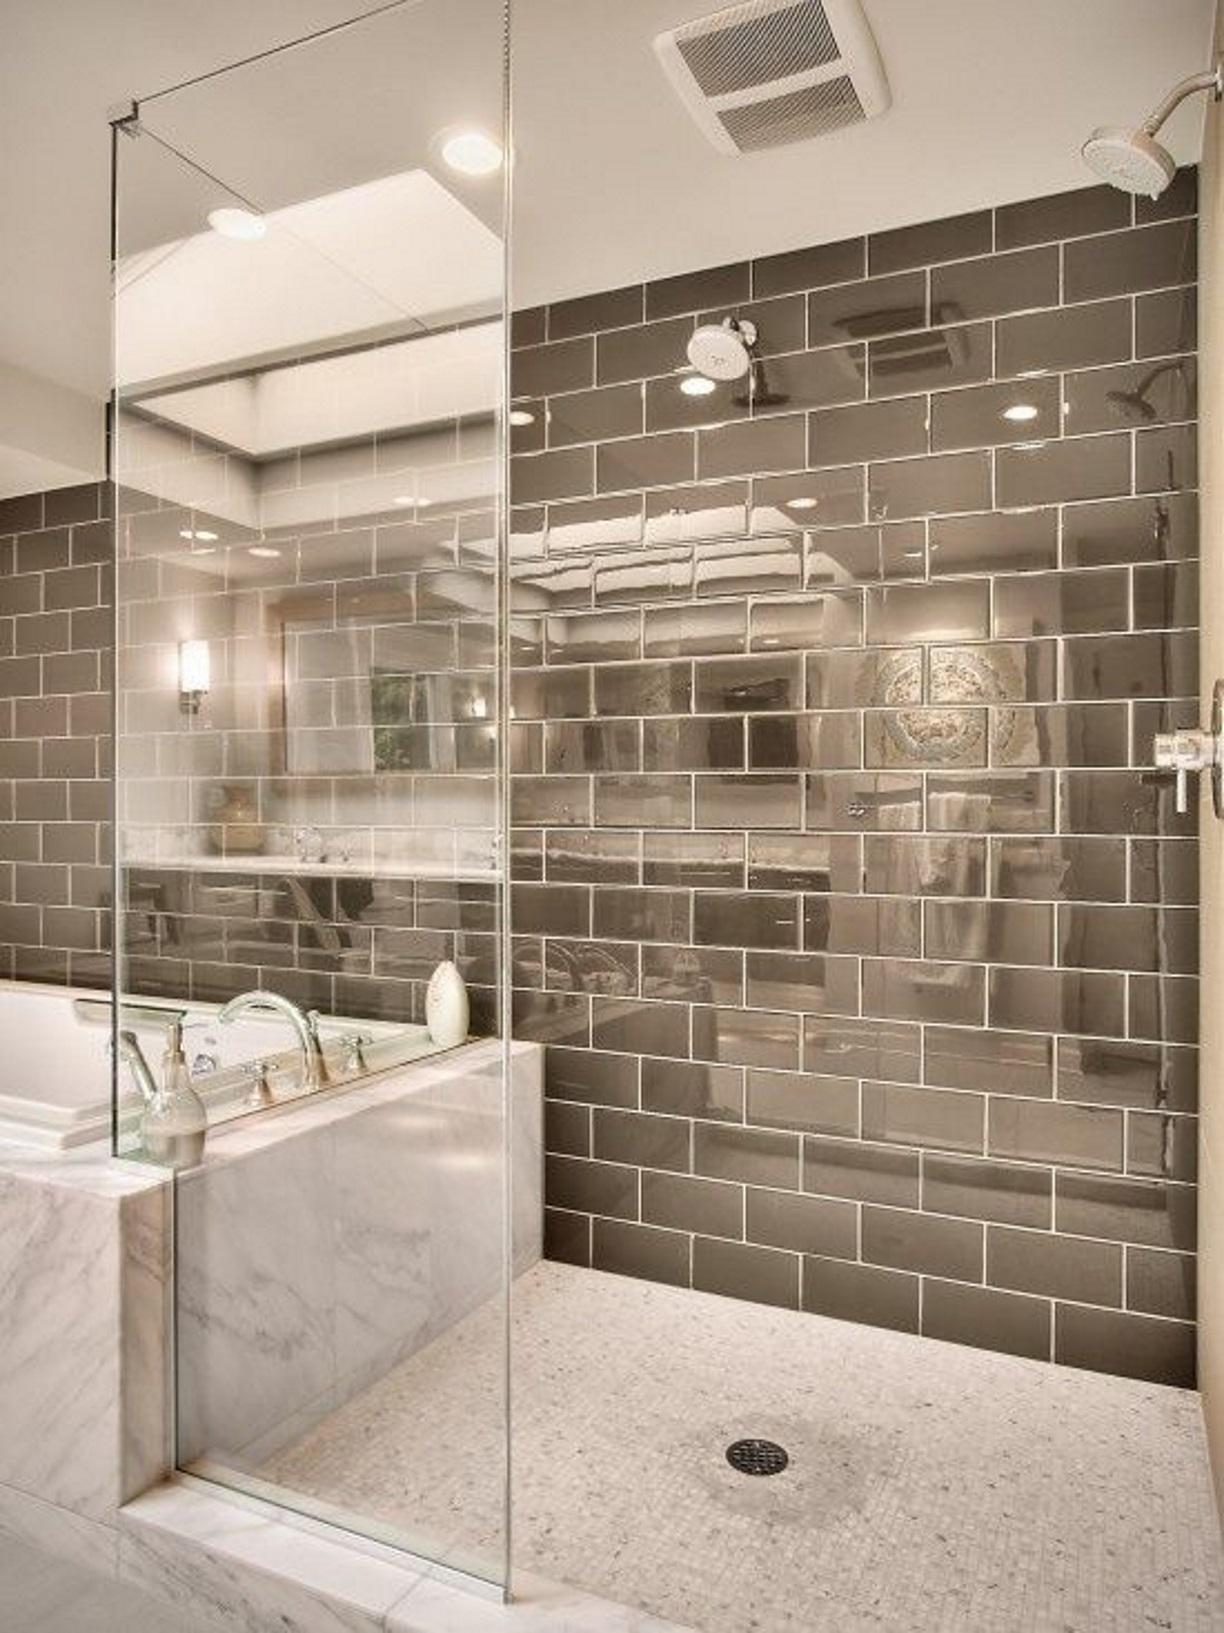 optimiser une petite salle de bains 8